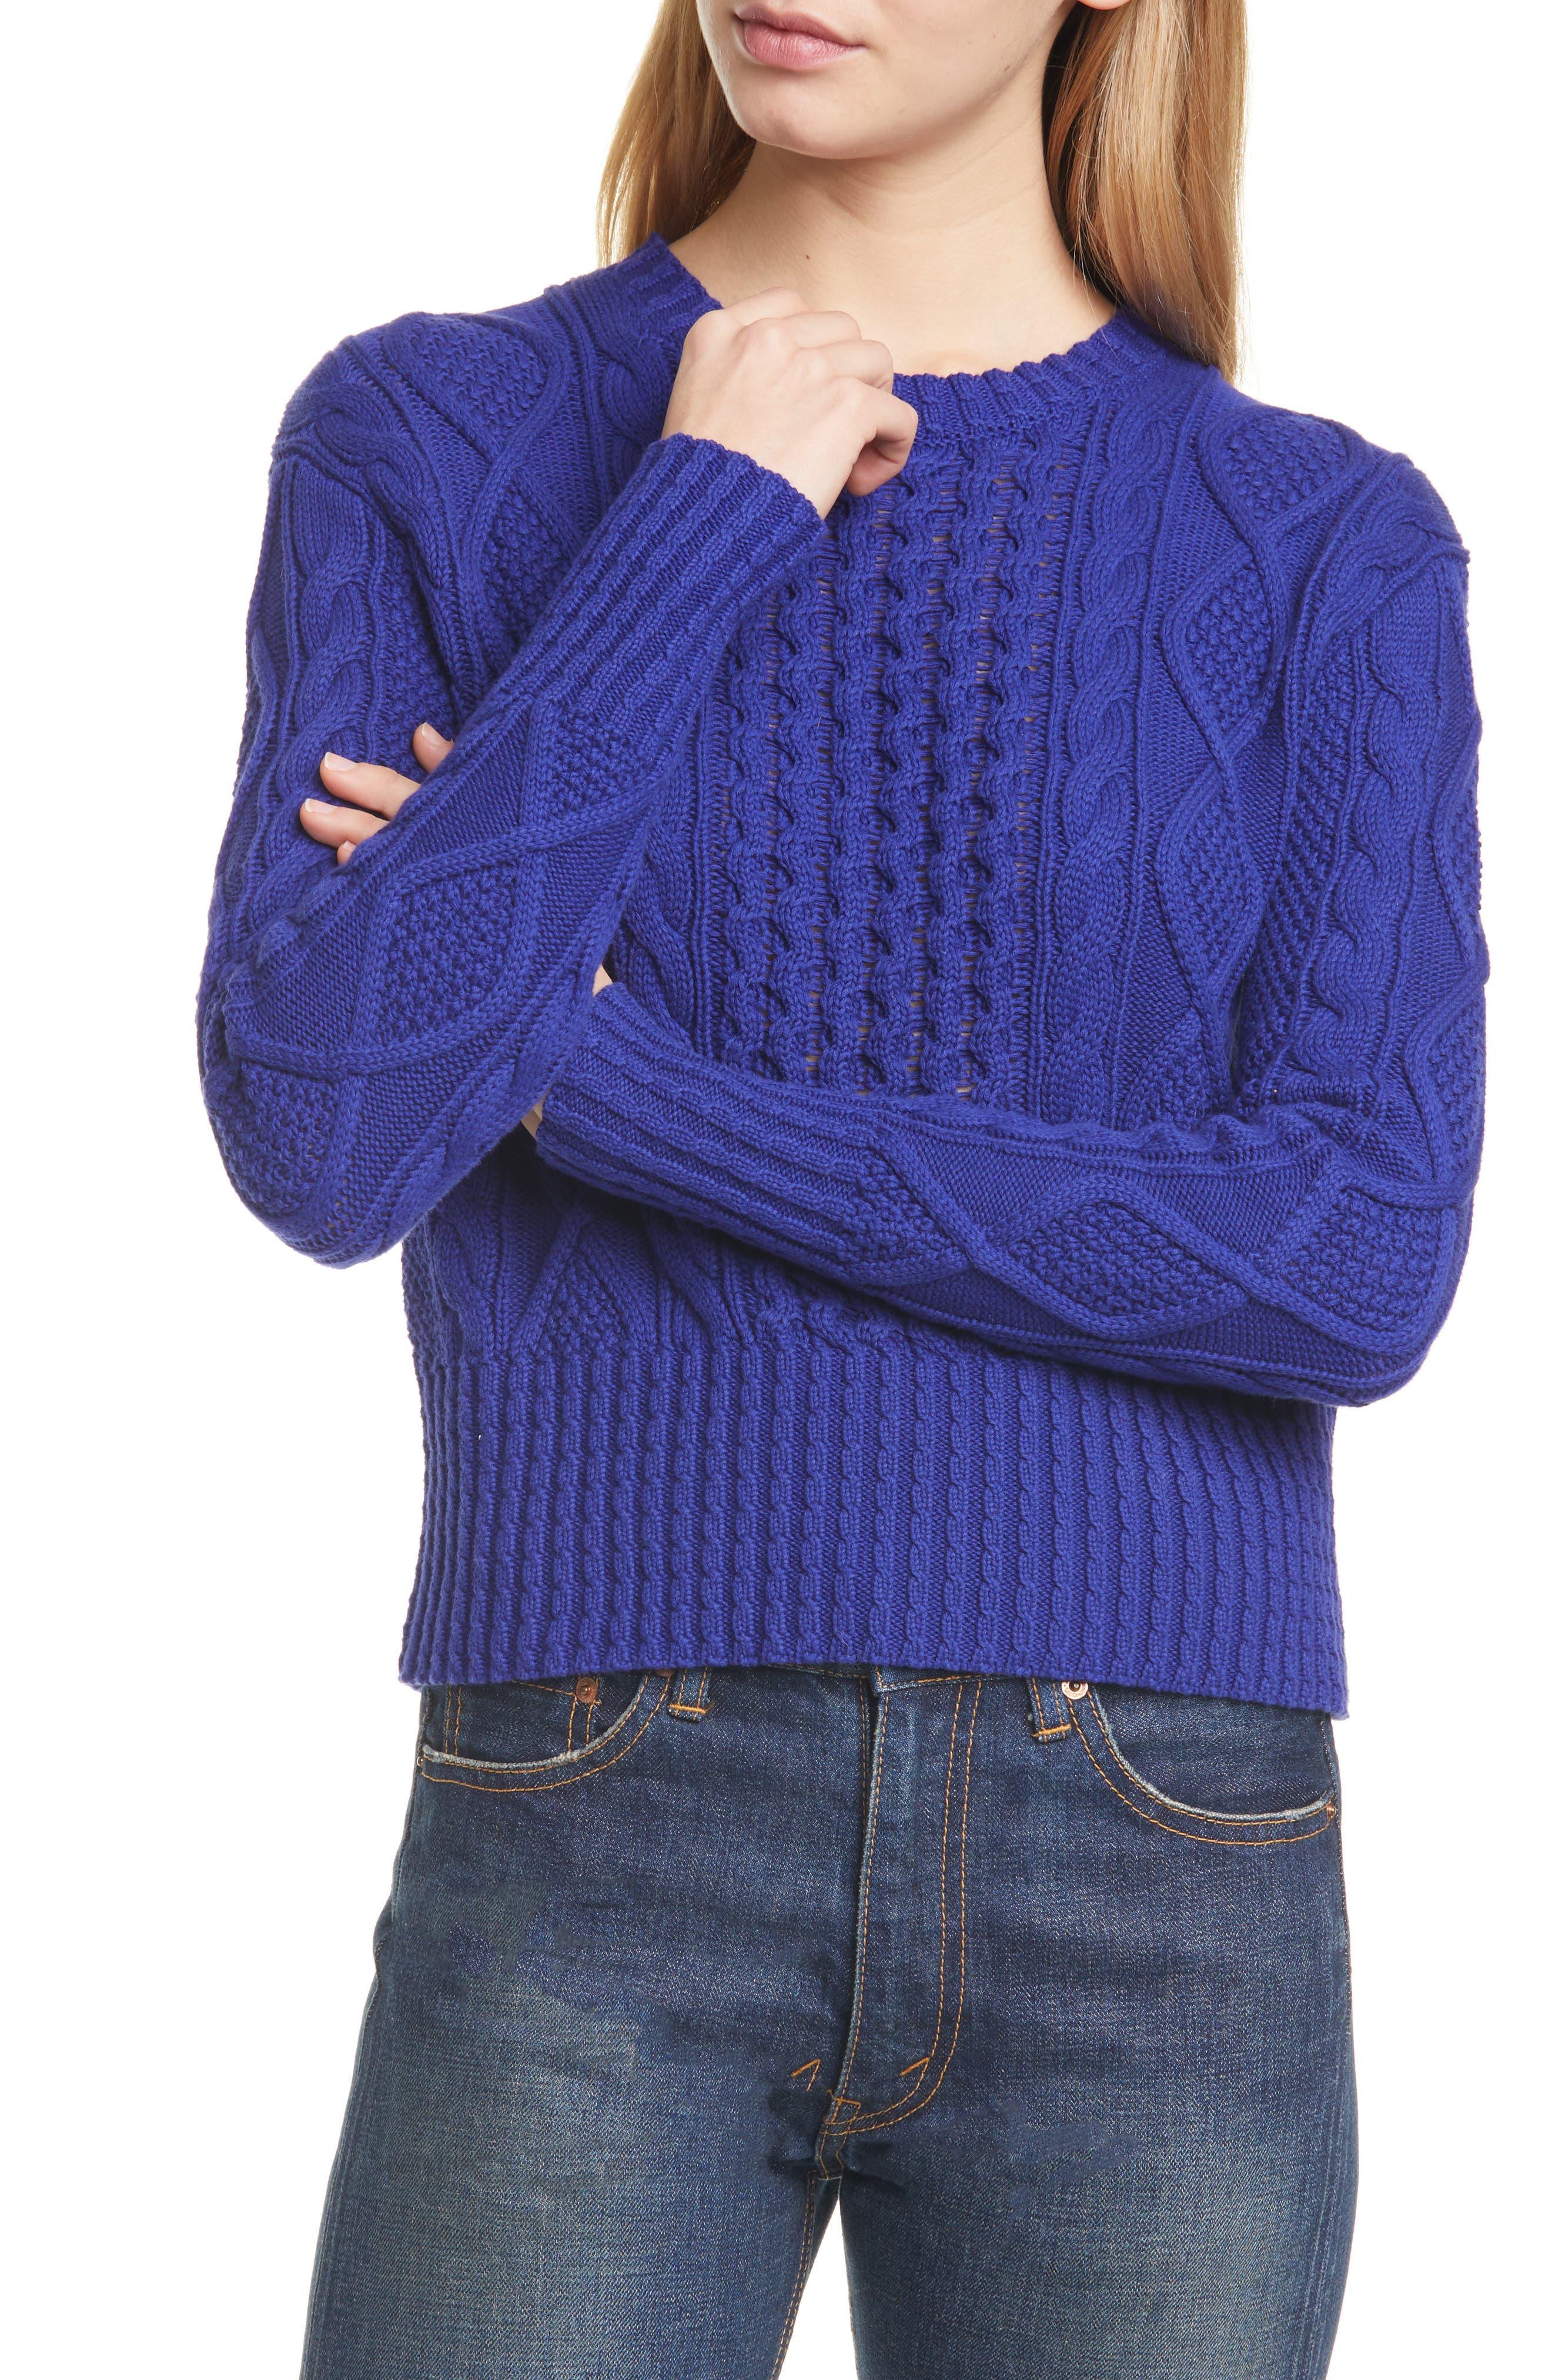 1930s Style Blouses, Shirts, Tops | Vintage Blouses Womens Polo Ralph Lauren Cotton Cable Sweater $74.00 AT vintagedancer.com